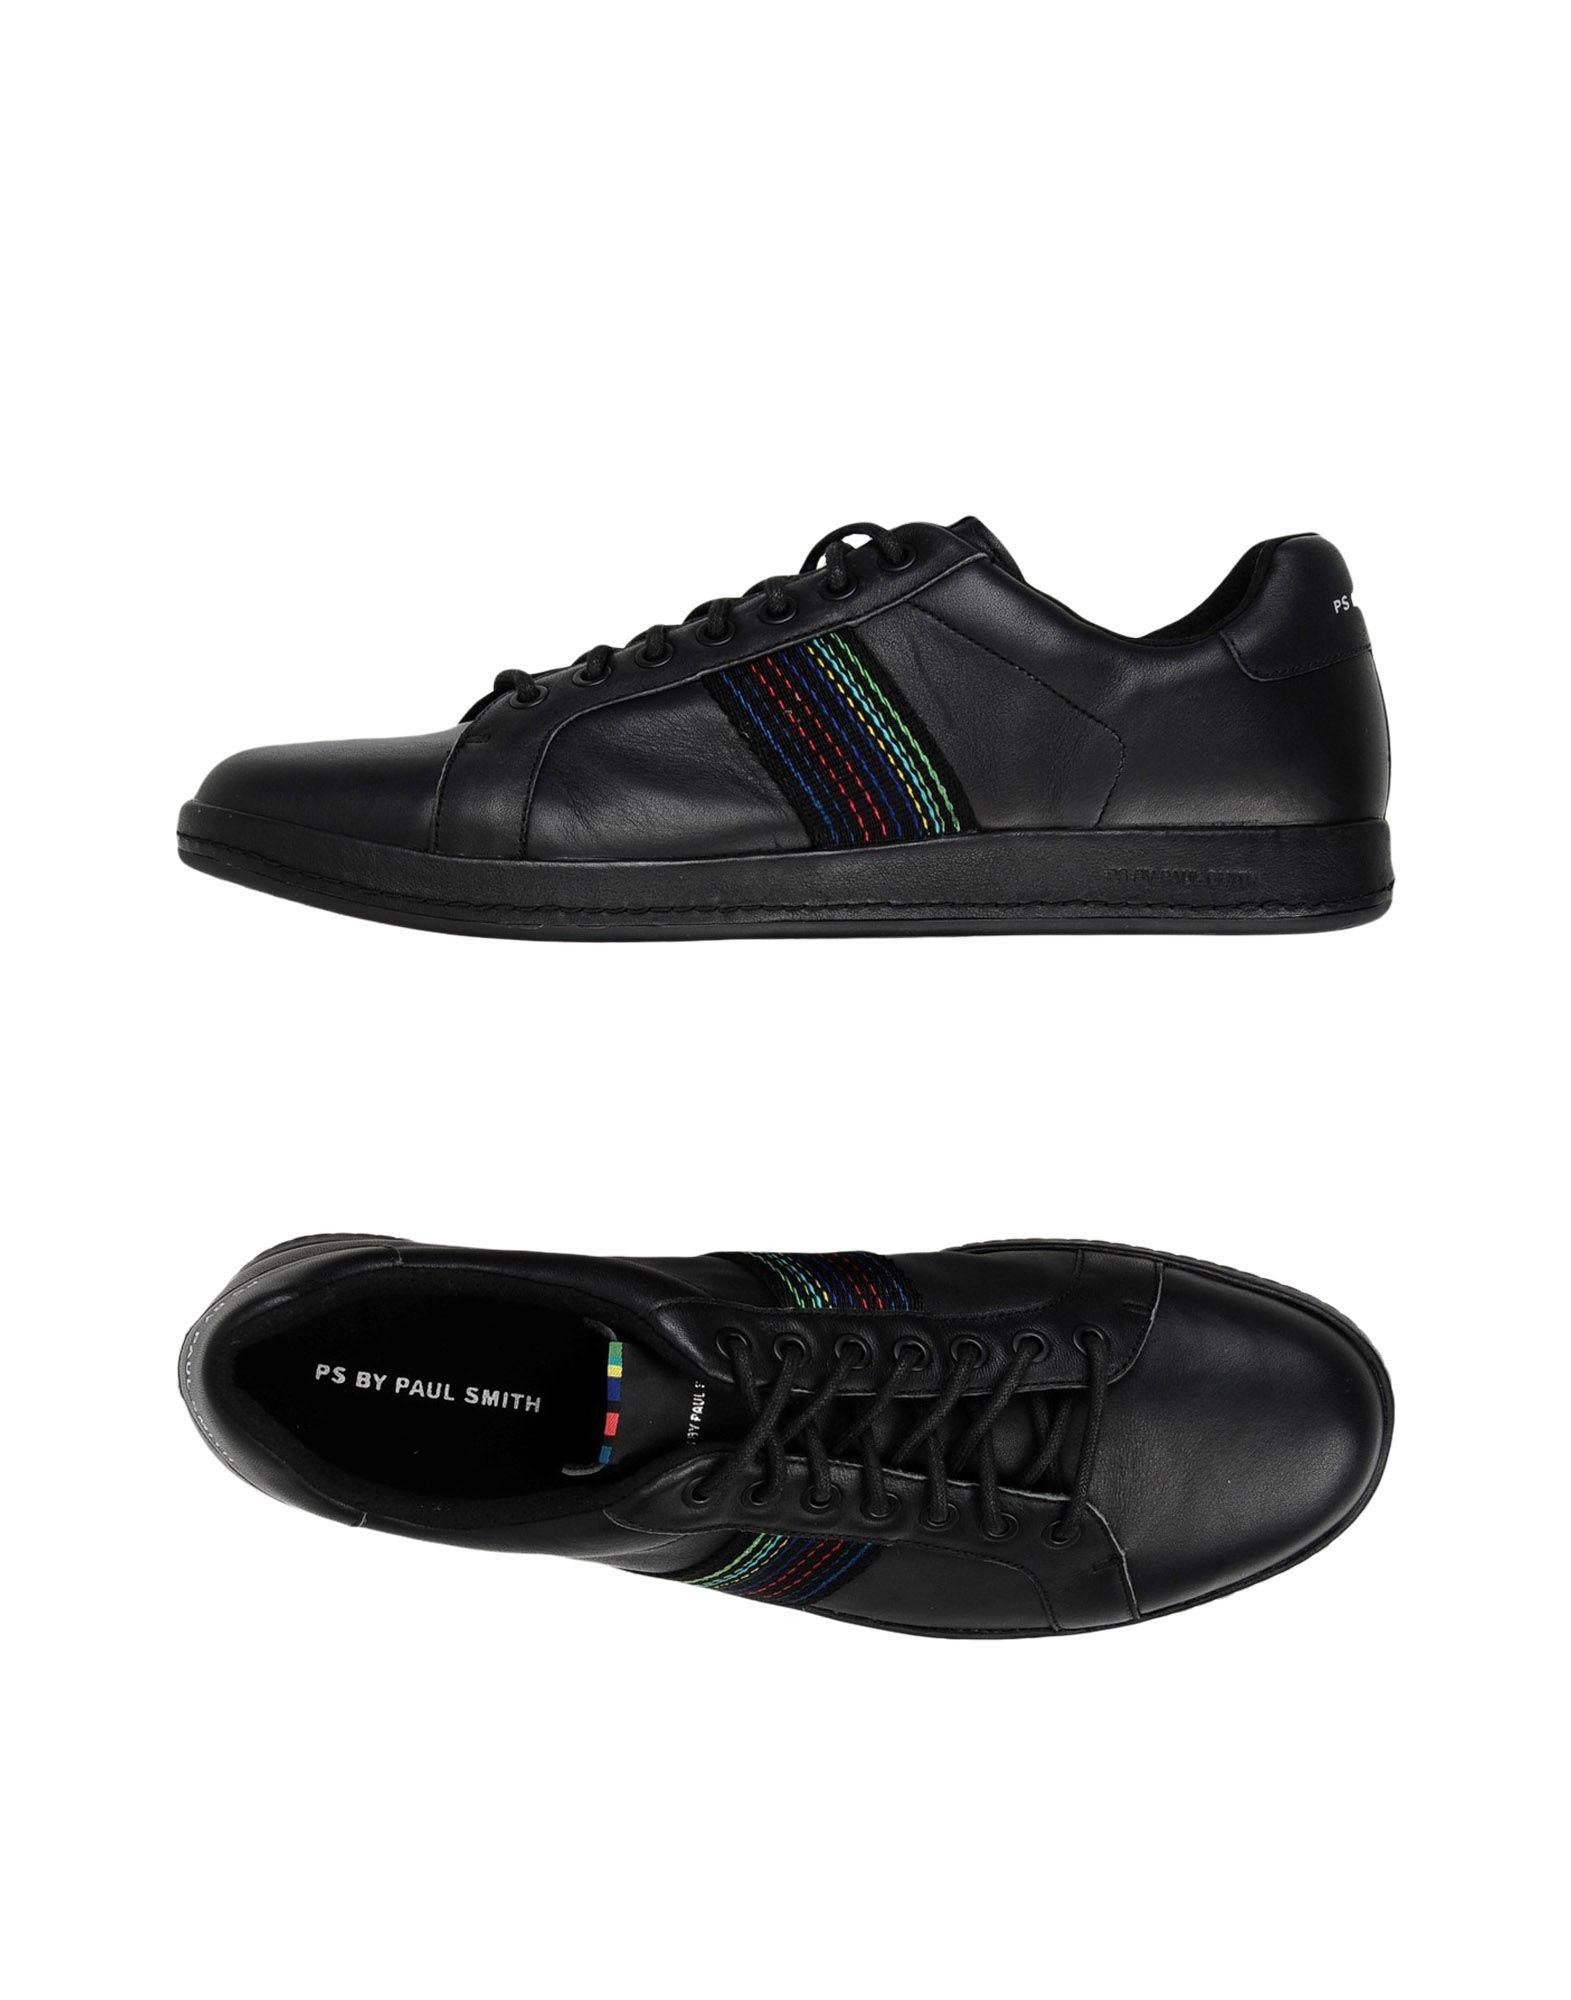 Ps By Paul Smith Mens Shoe Lapin Black  11312716OU Gute Qualität beliebte Schuhe